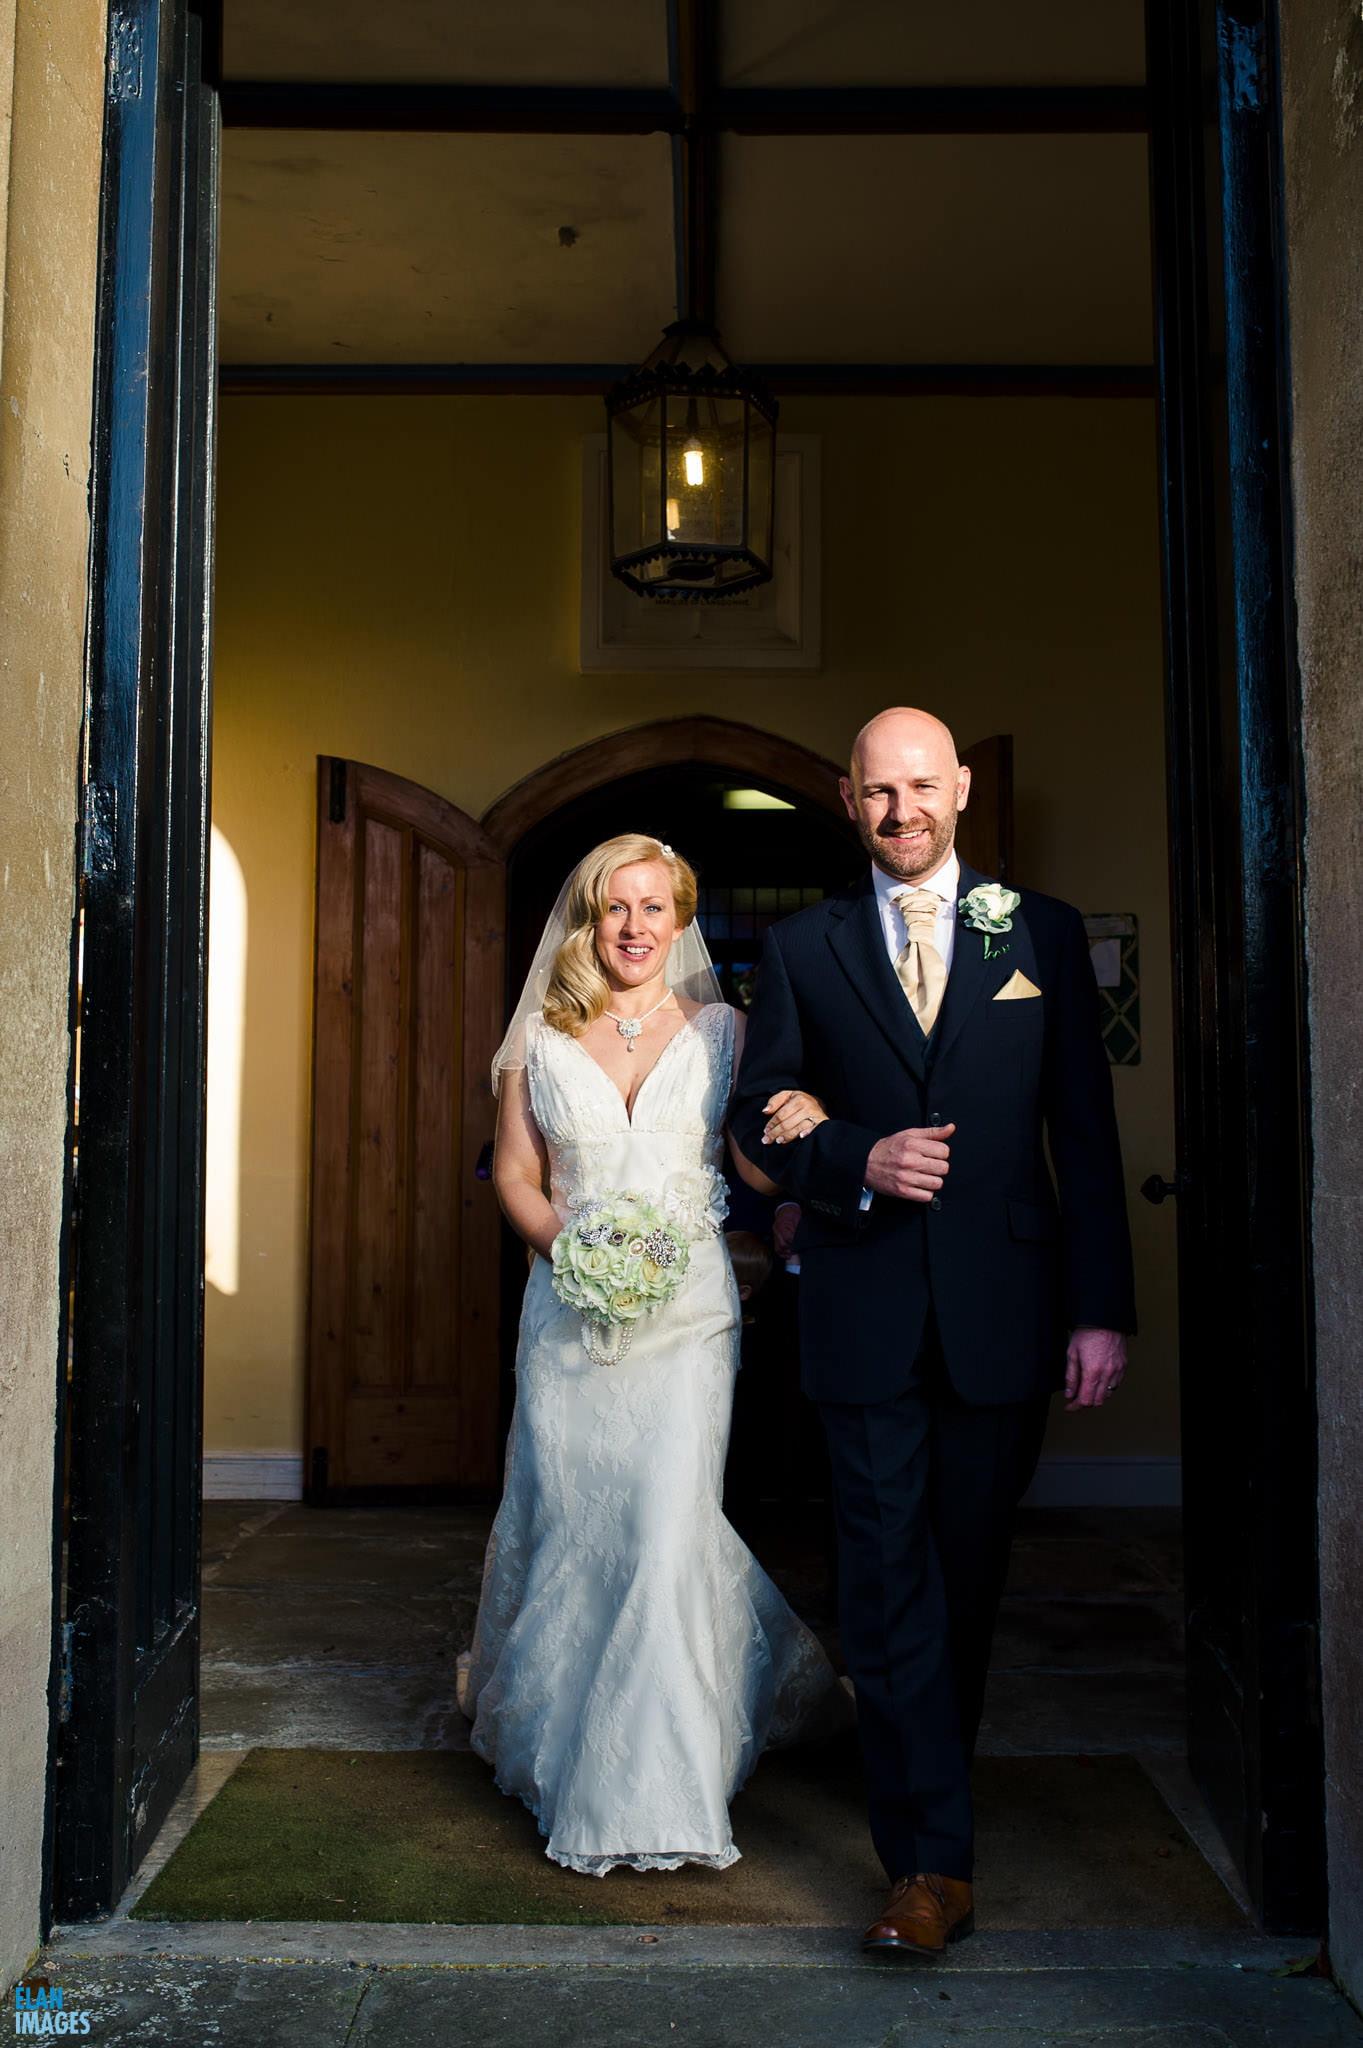 Wedding at leigh park hotel -064